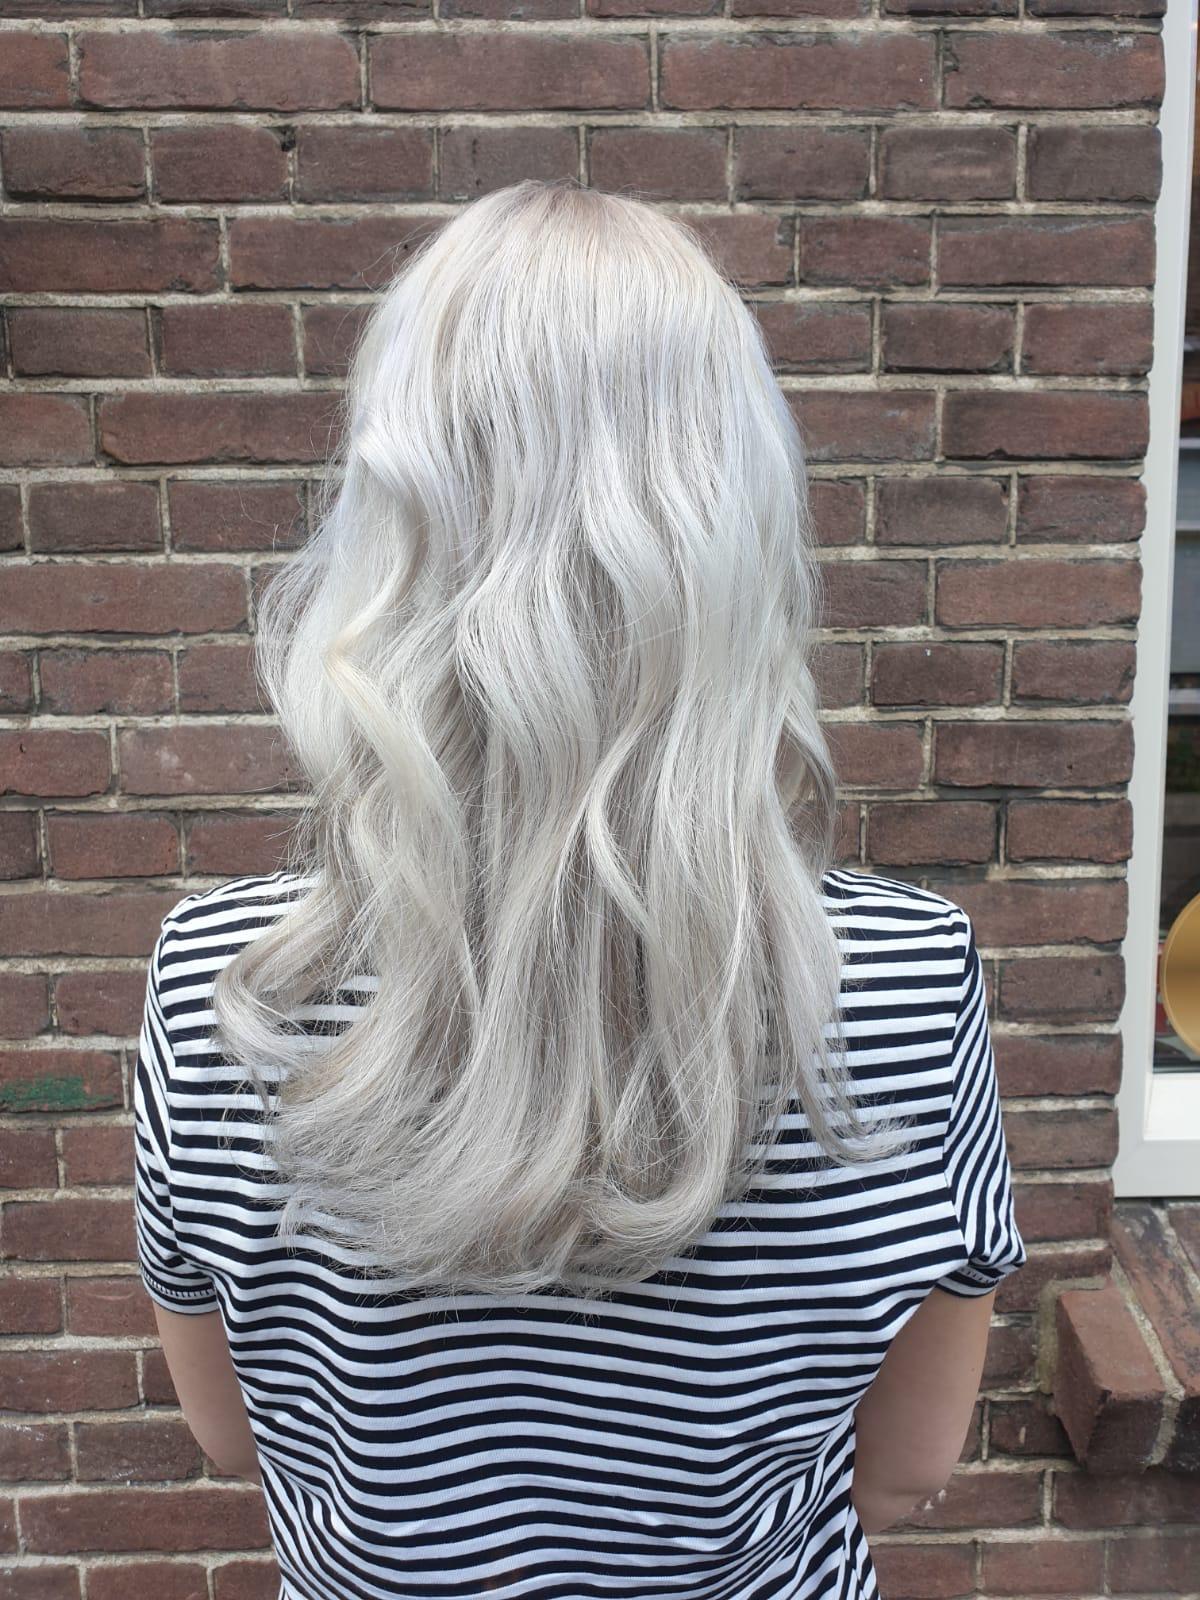 d6e79e01 0de4 4e4e 85cd 40452e1a59ef - Elise's Weekly Pictorama #33 - Zomerse taferelen & Happy New Hair!